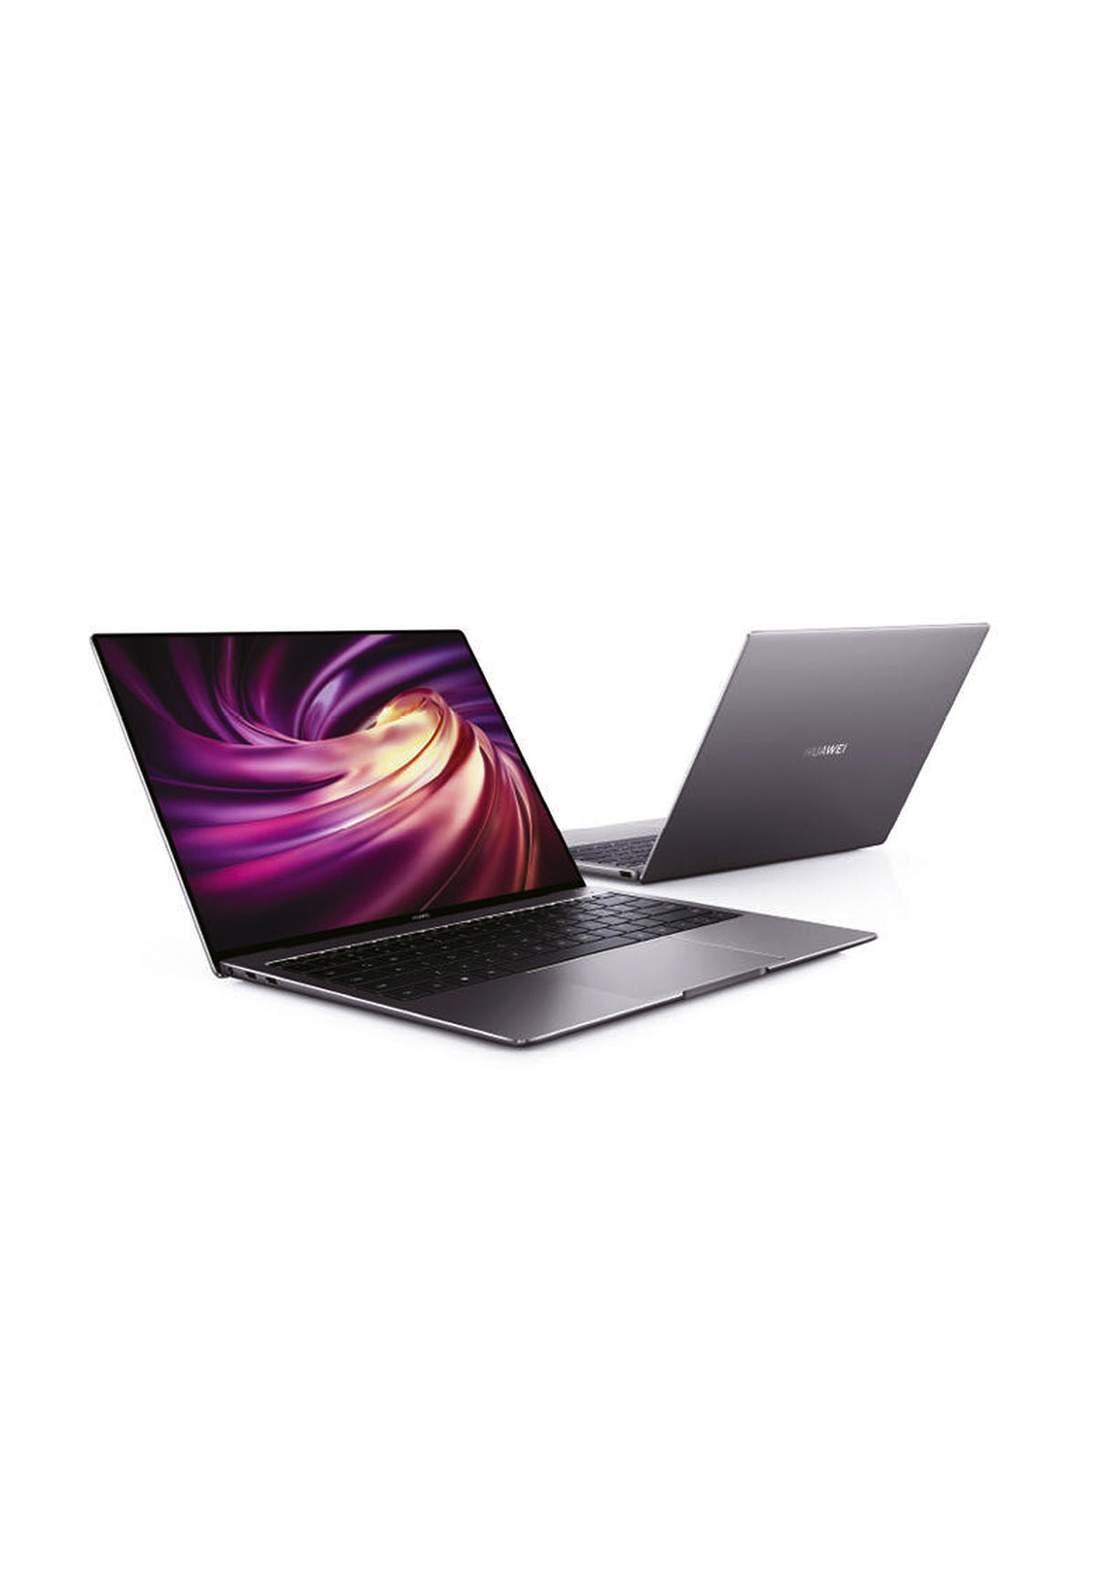 Huawei MateBook X PRO - Core i7-10510U - 16 GB RAM - 1 TB SSD - Gray